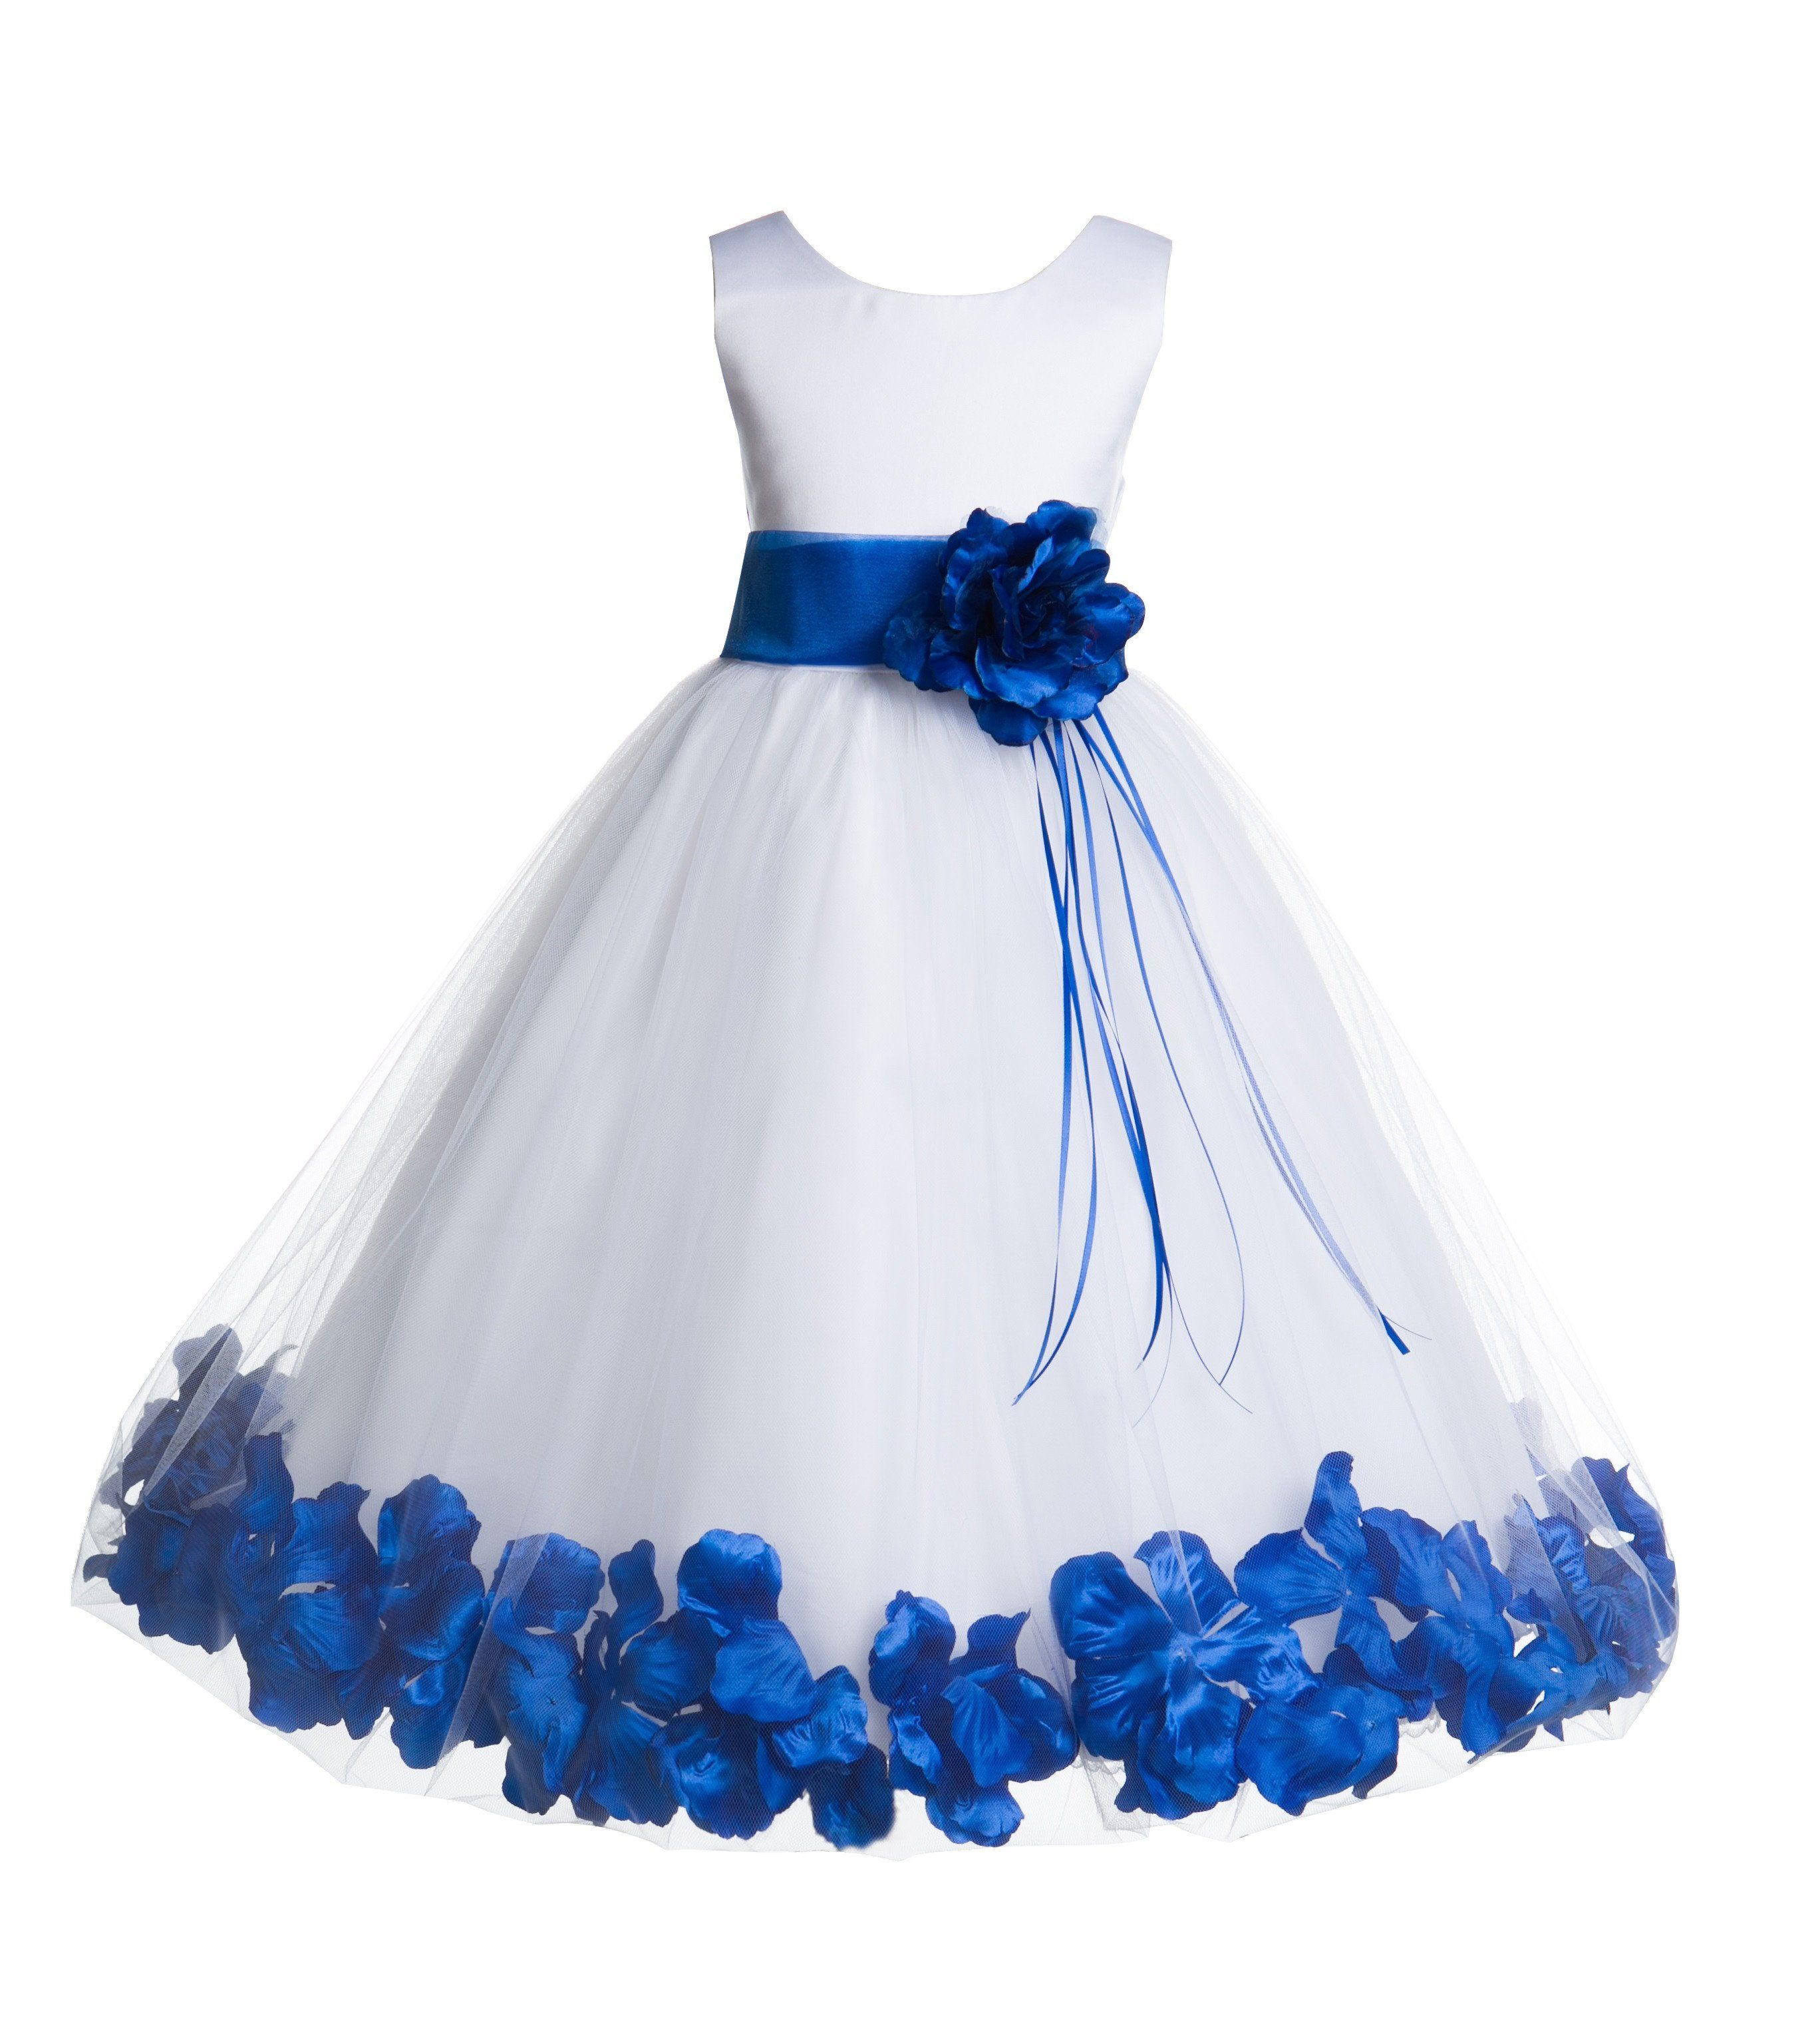 WHITE V-SHAPED BRIDESMAID TODDLER PAGEANT RECITAL FLOWER GIRL DRESS CAP SLEEVES